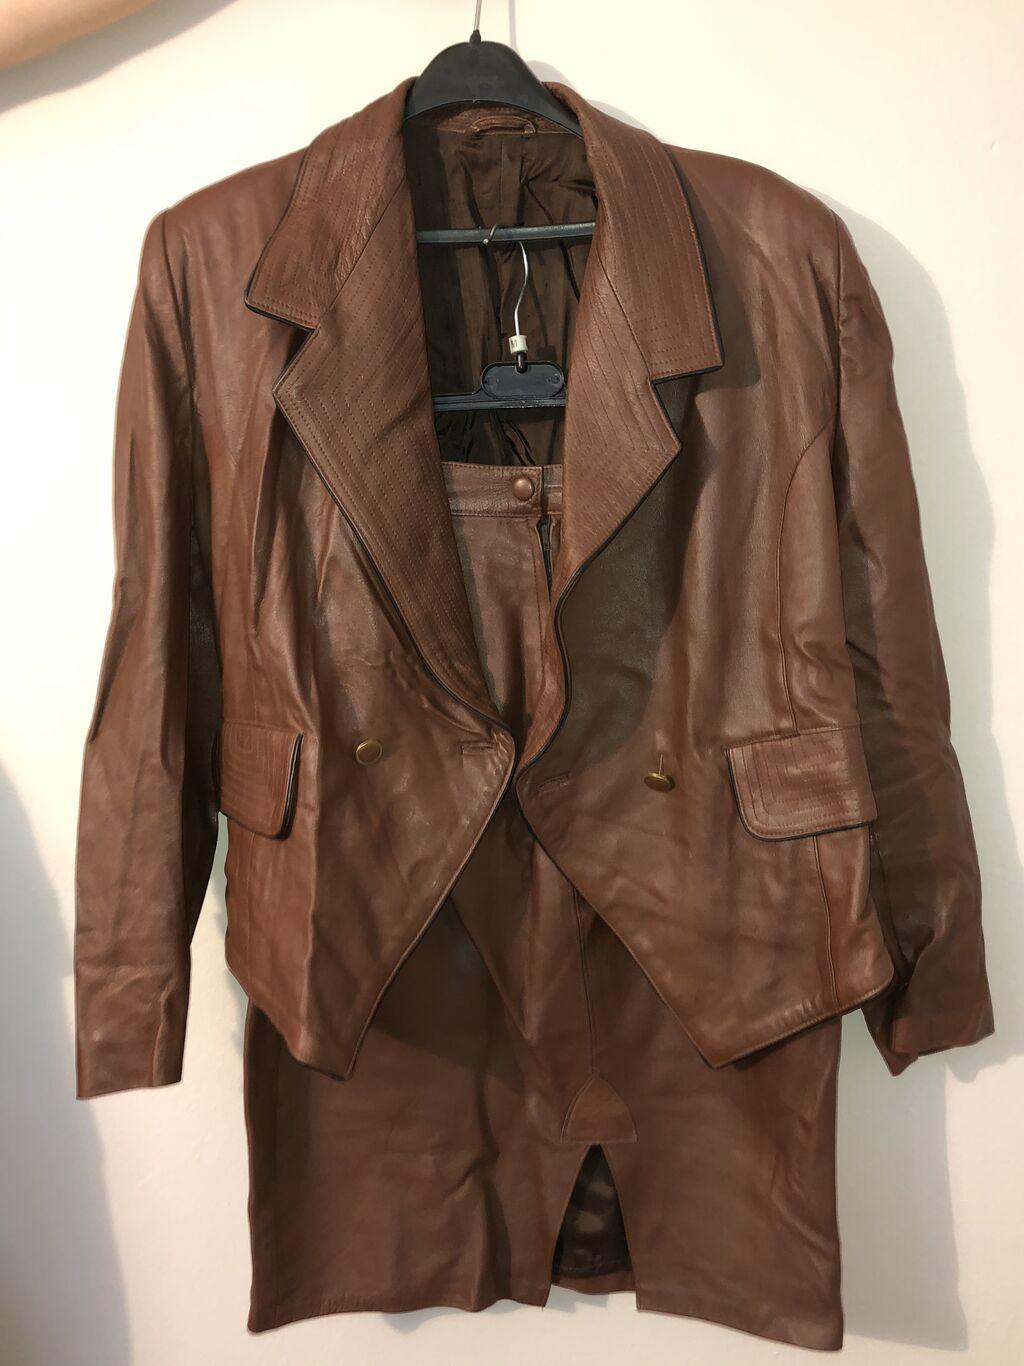 Komplet kožna jakna i kožna suknj (od prave kože), veličina 40, cena 7000 dinara, kao novo, dobro očuvano